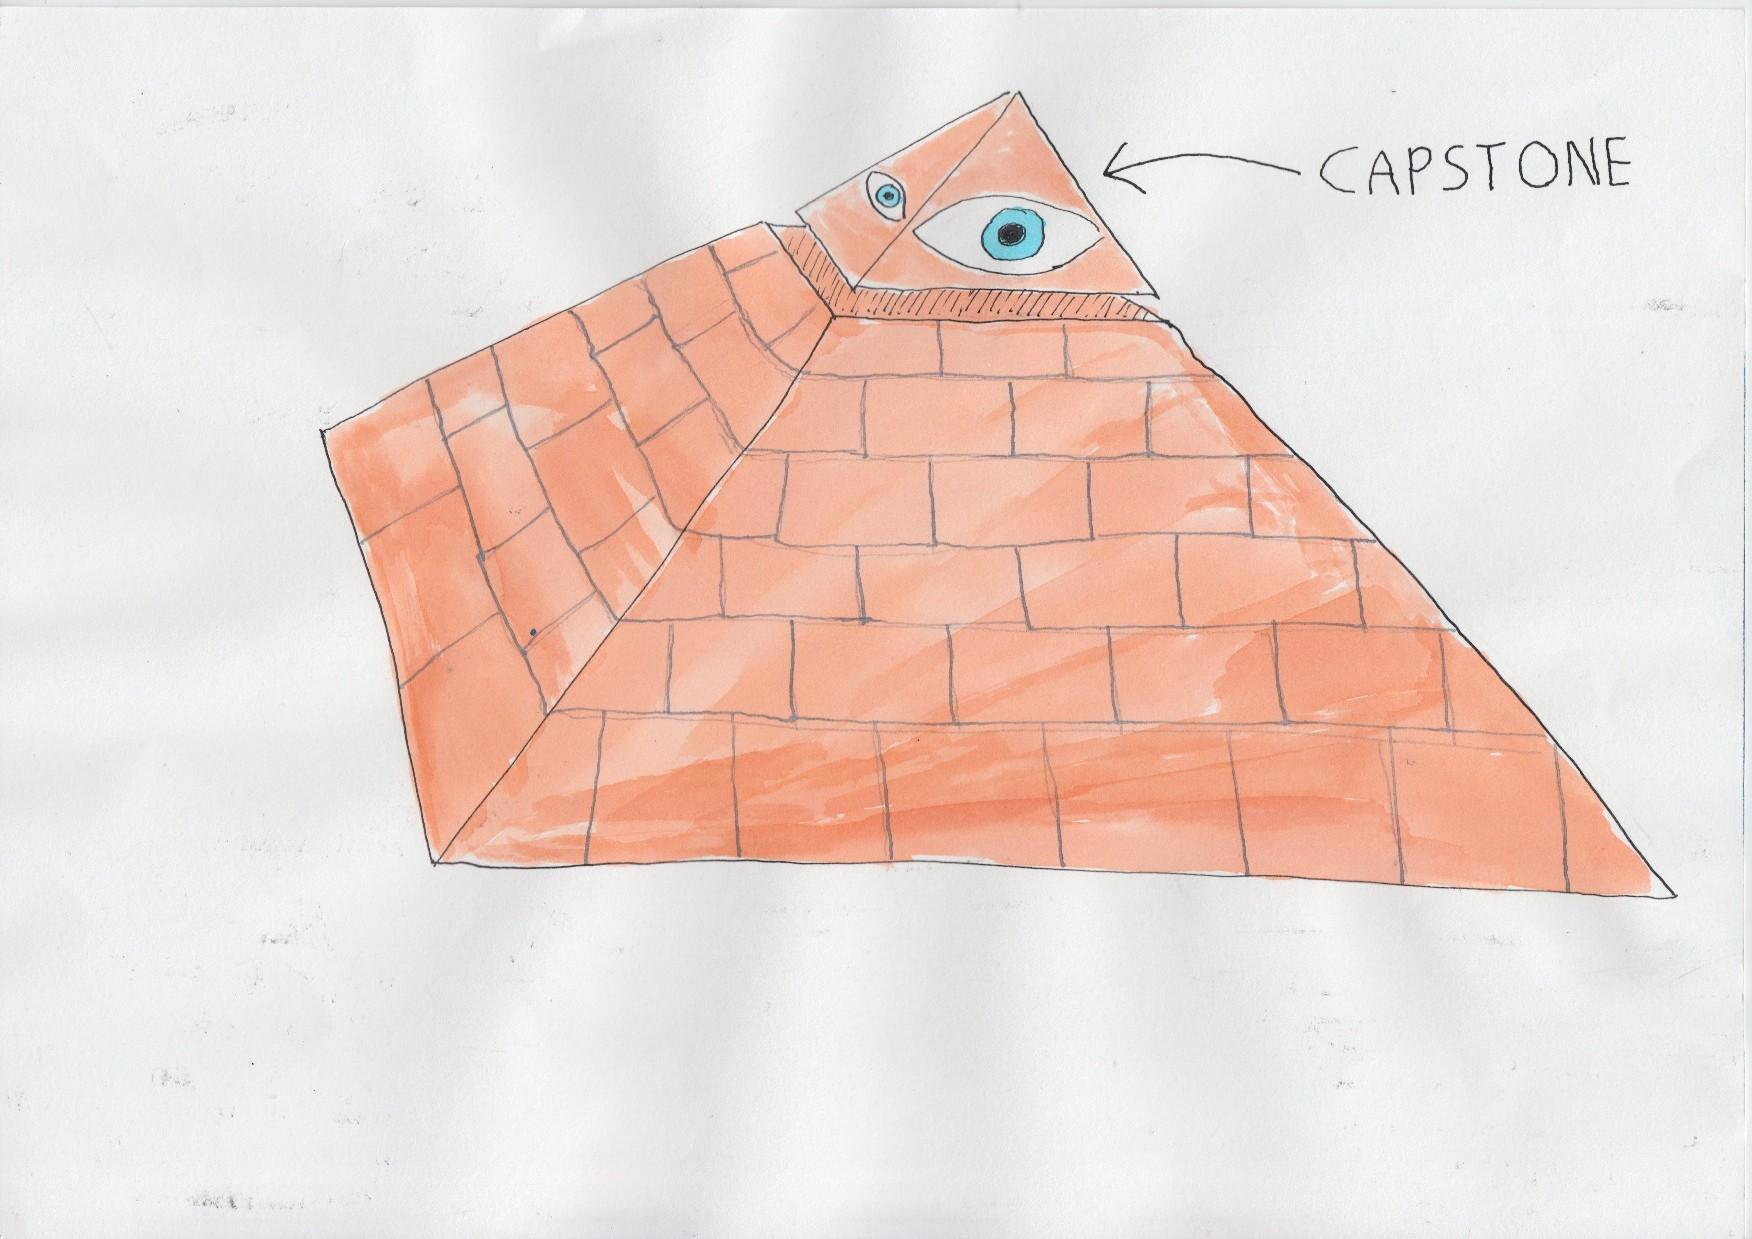 Best Capstone Project Ideas